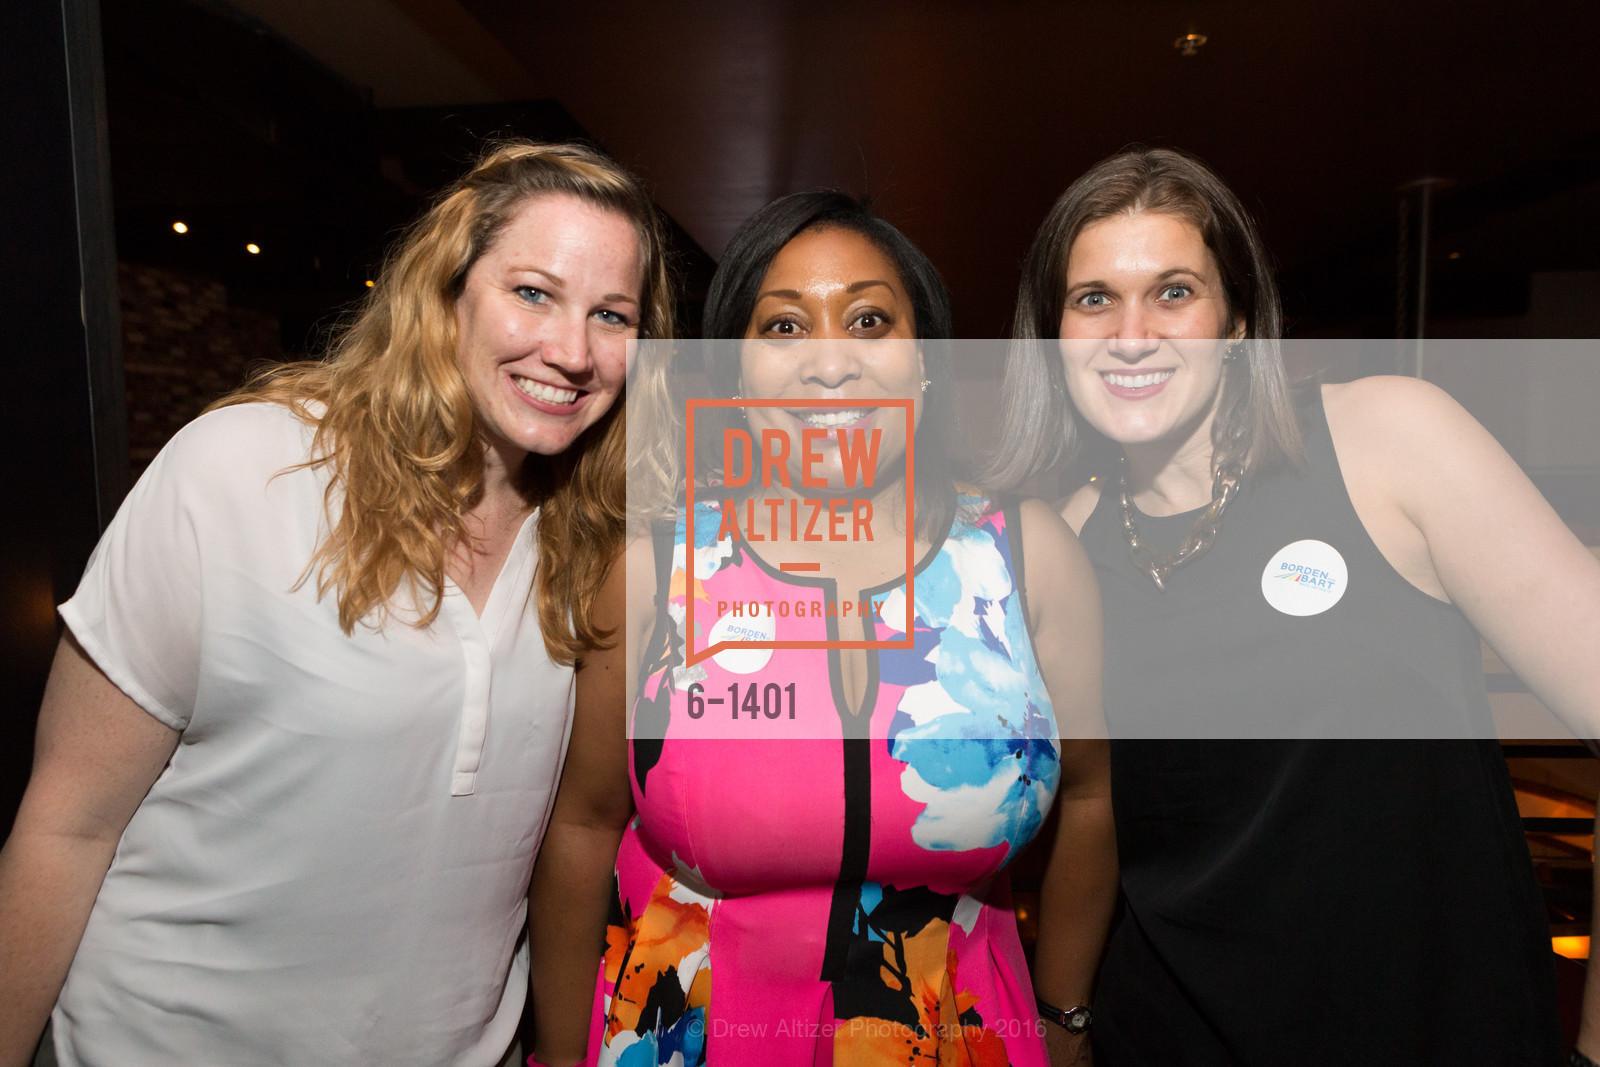 Samantha Higgins, Gwyneth Borden, Emily Martin, Photo #6-1401